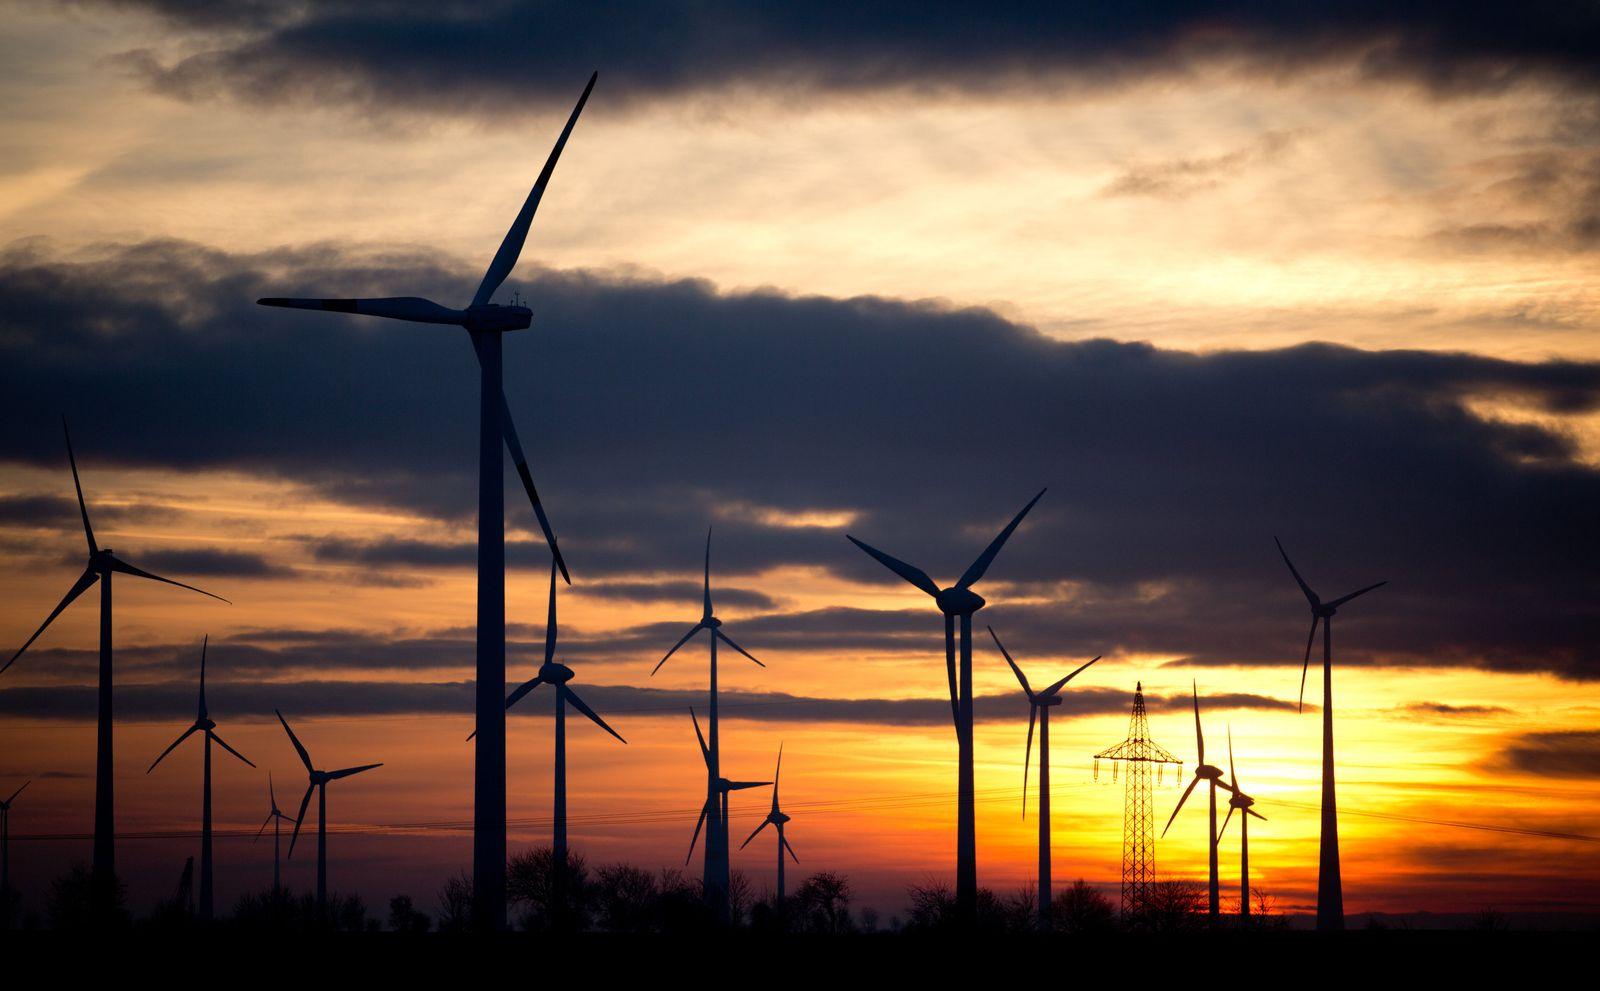 Energie / Windenergie / Windräder / Windrad